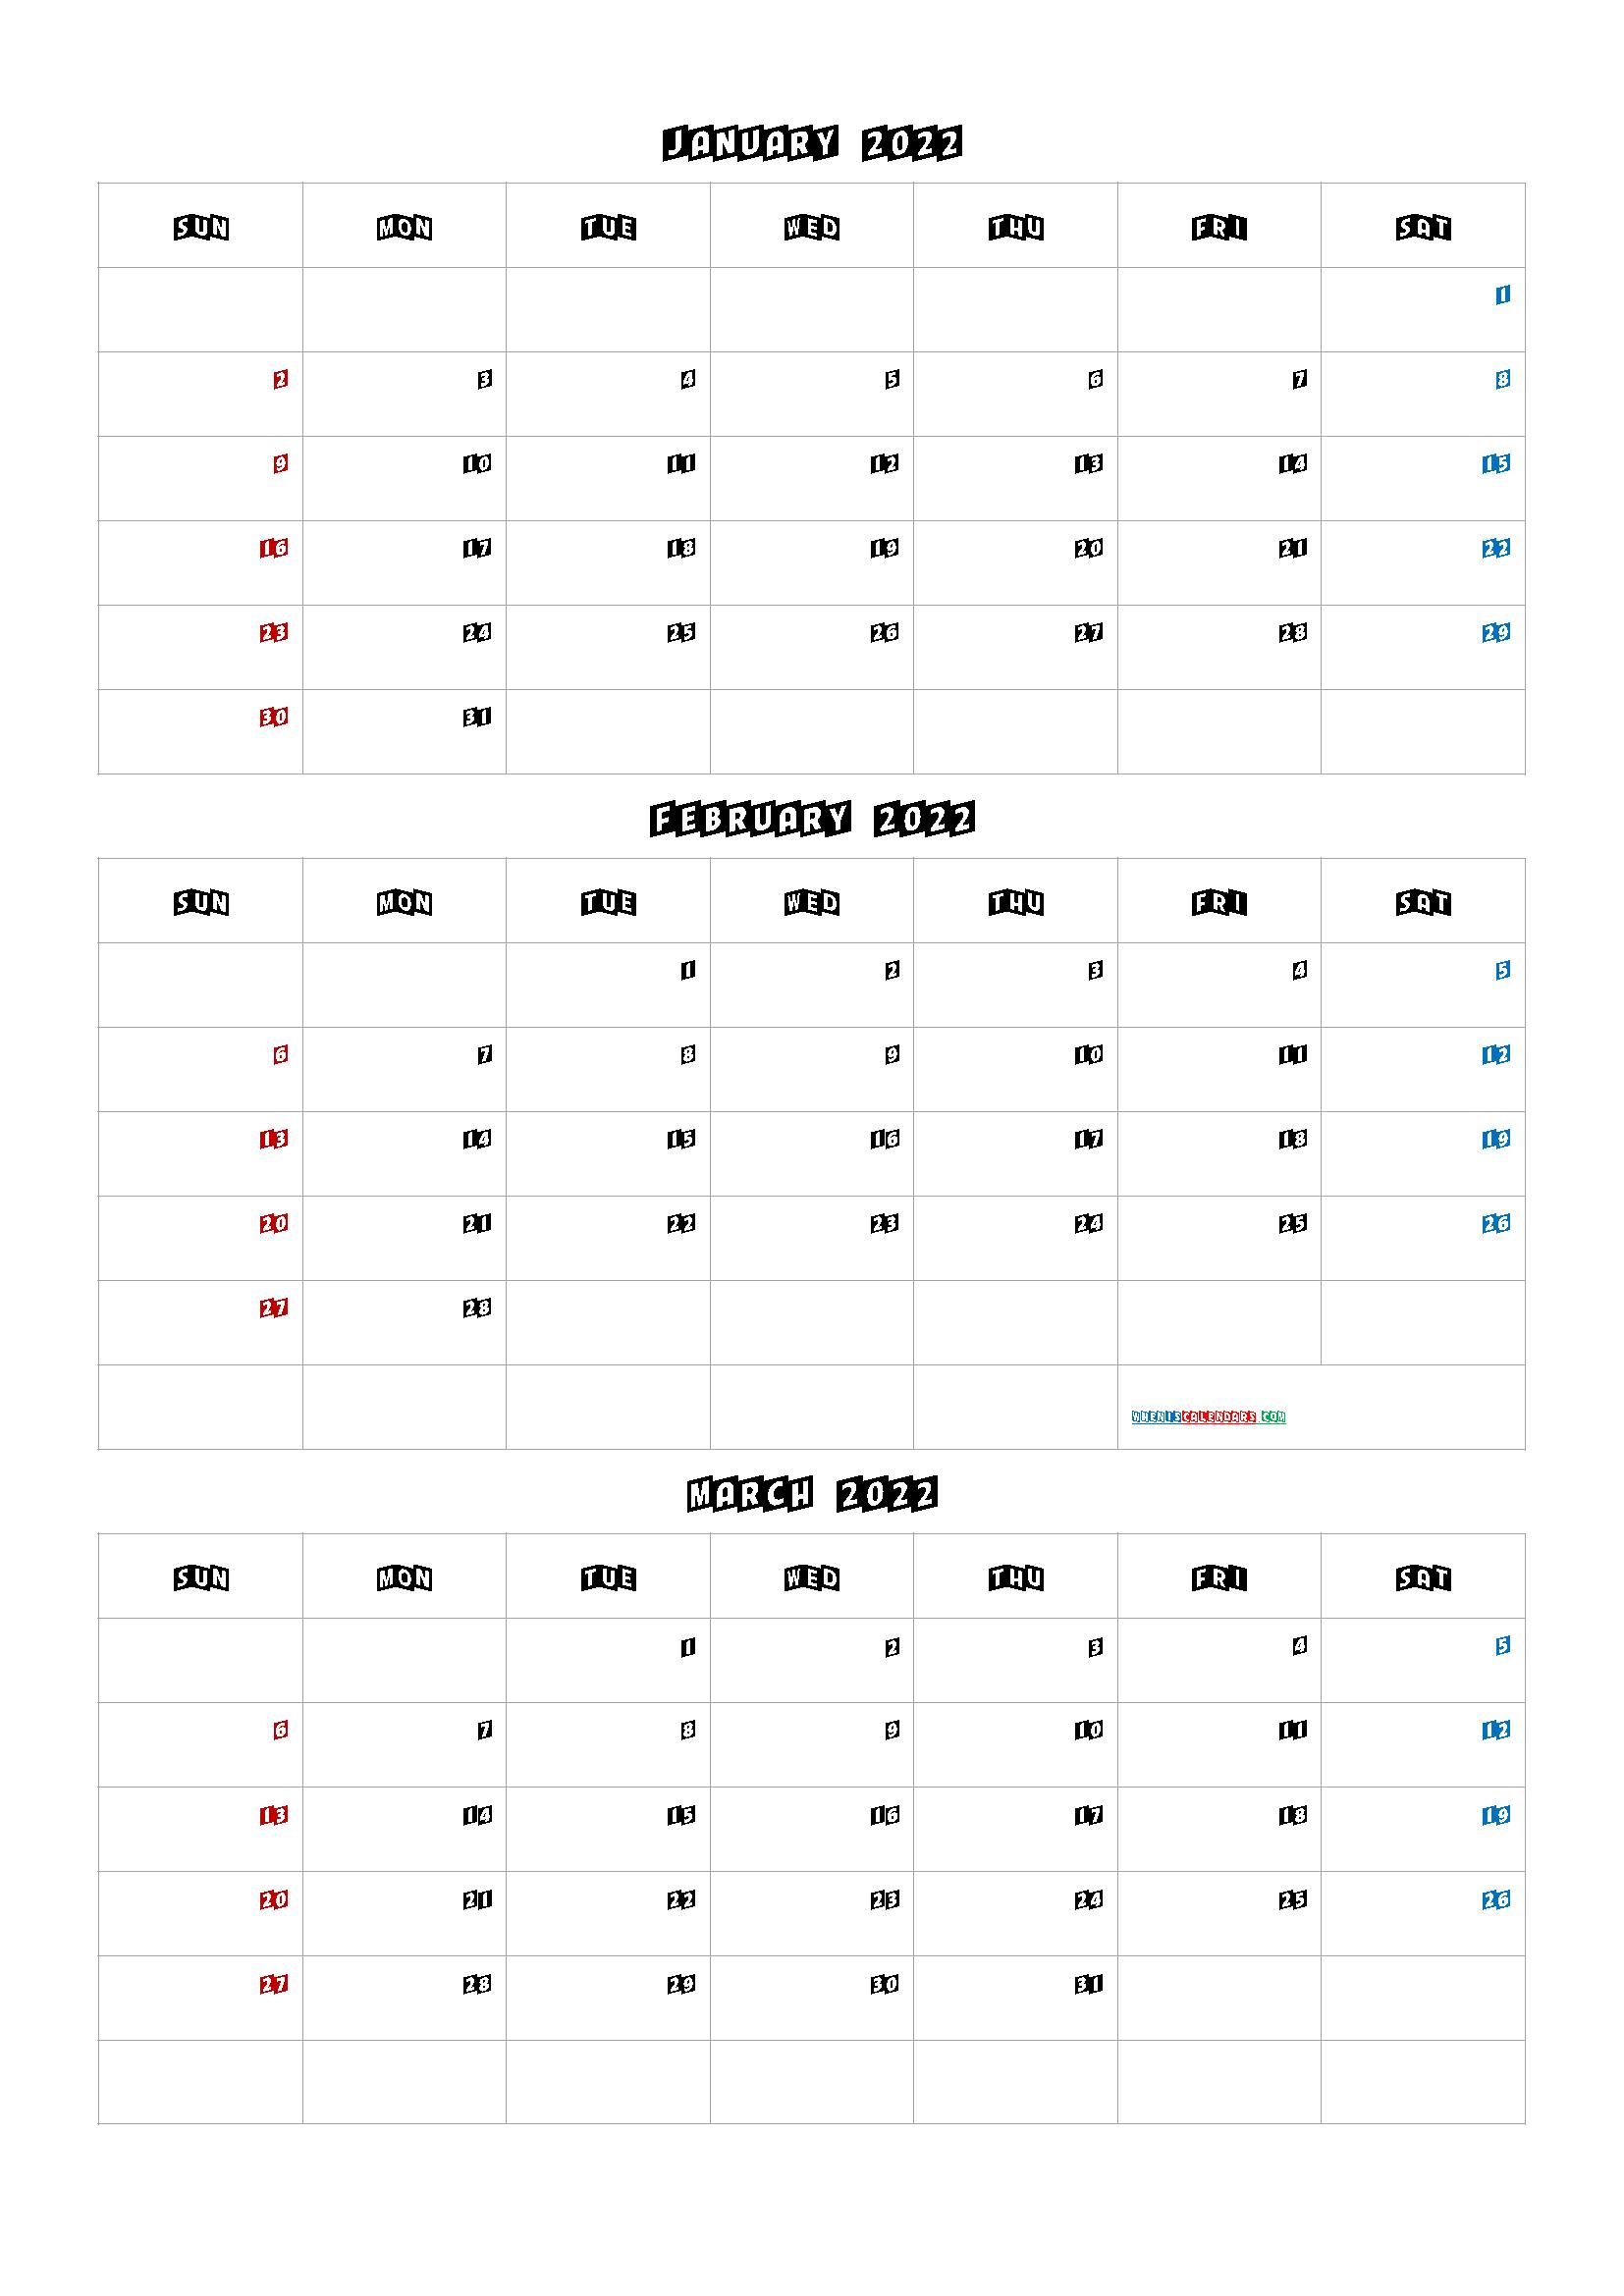 Free January February March 2022 Calendar [Q1 Q2 Q3 Q4] | January